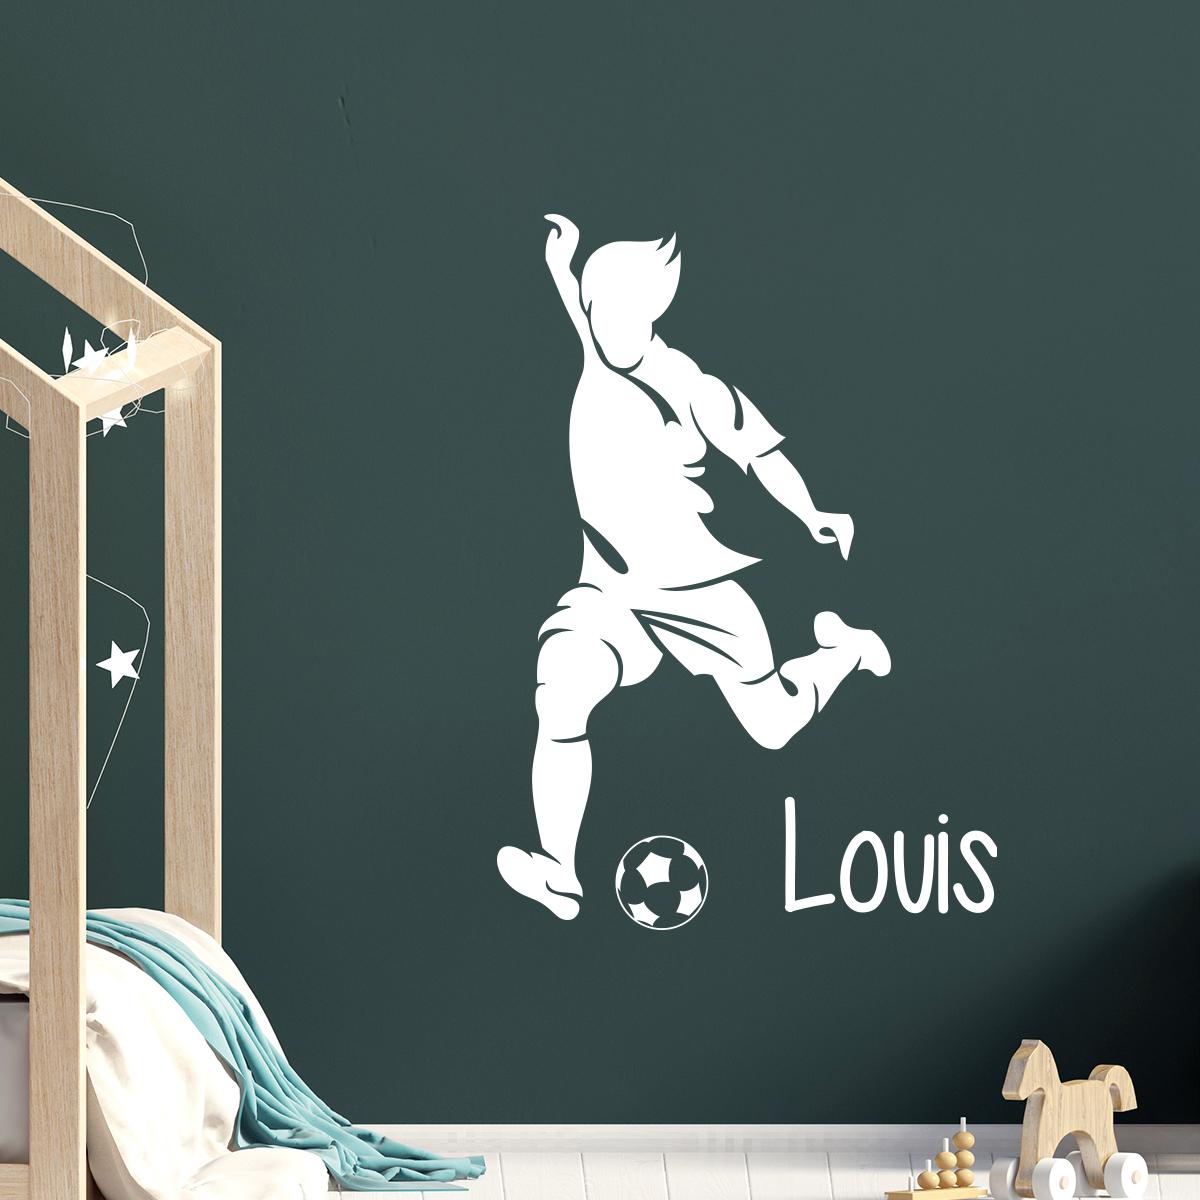 Sticker pr nom personnalis footballeur avec la balle sports et football football ambiance - Stickers muraux personnalise ...